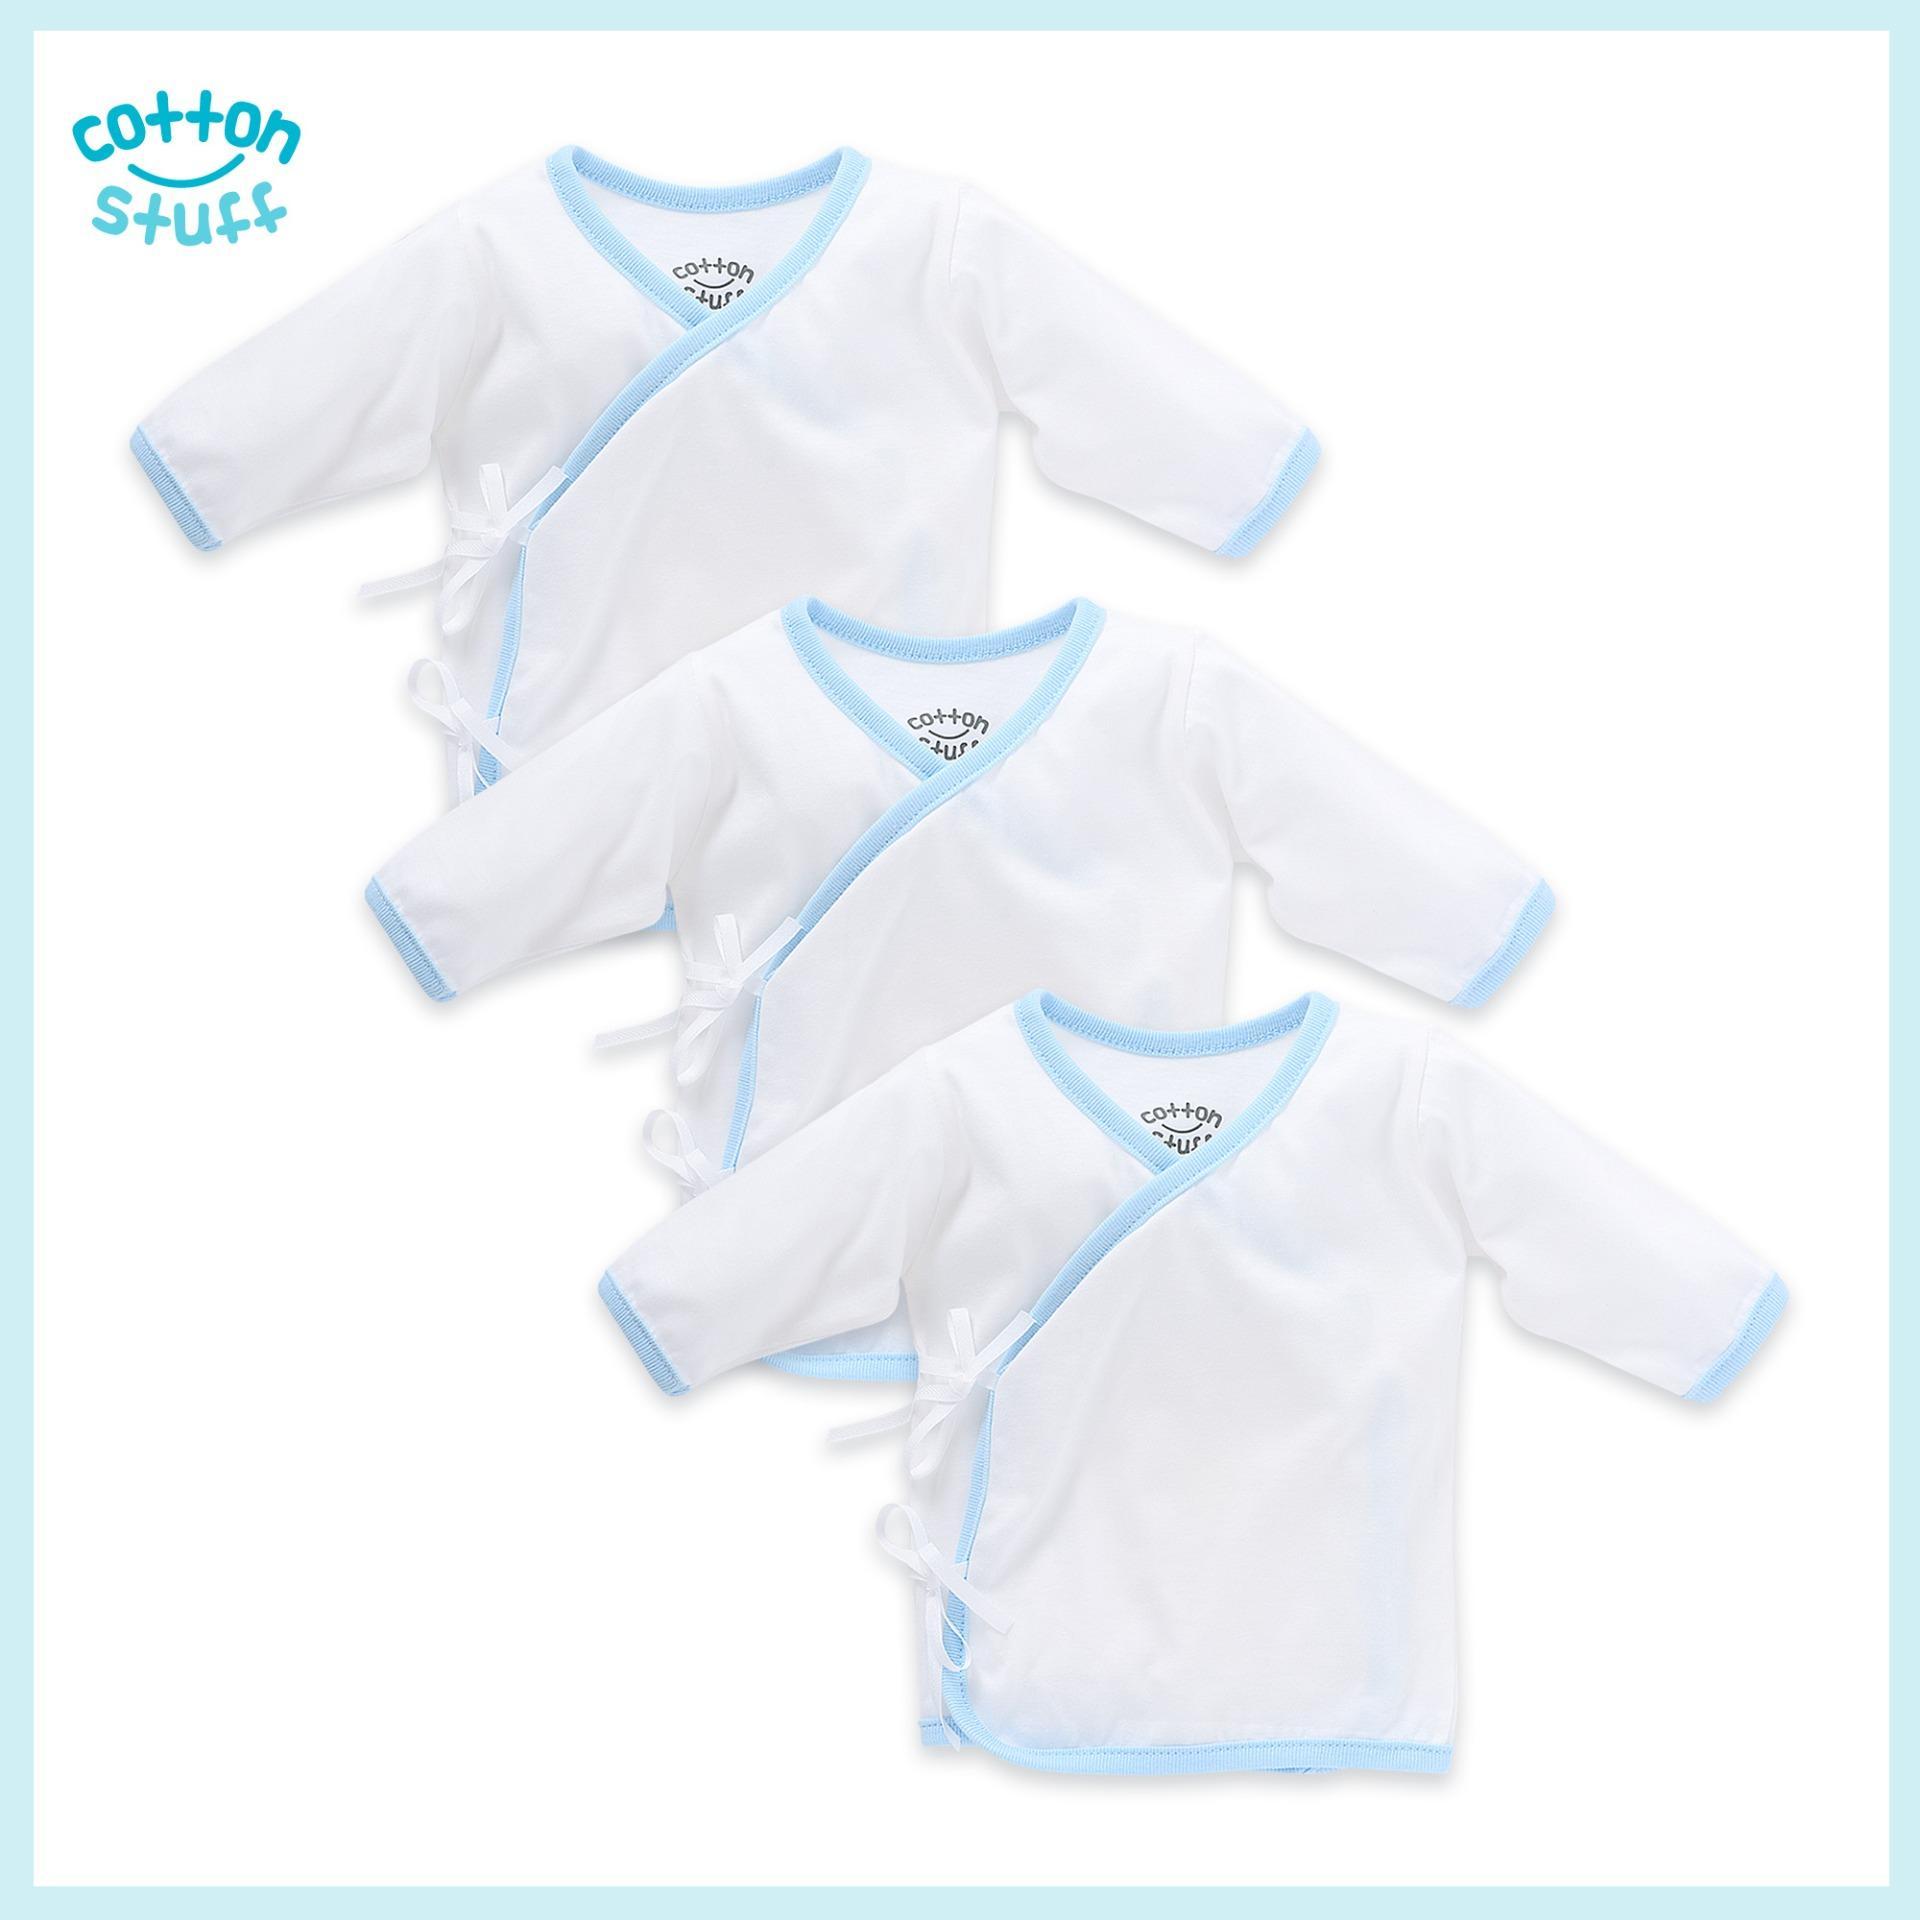 3447ca157c10 Cotton Stuff Philippines  Cotton Stuff price list - Mittens